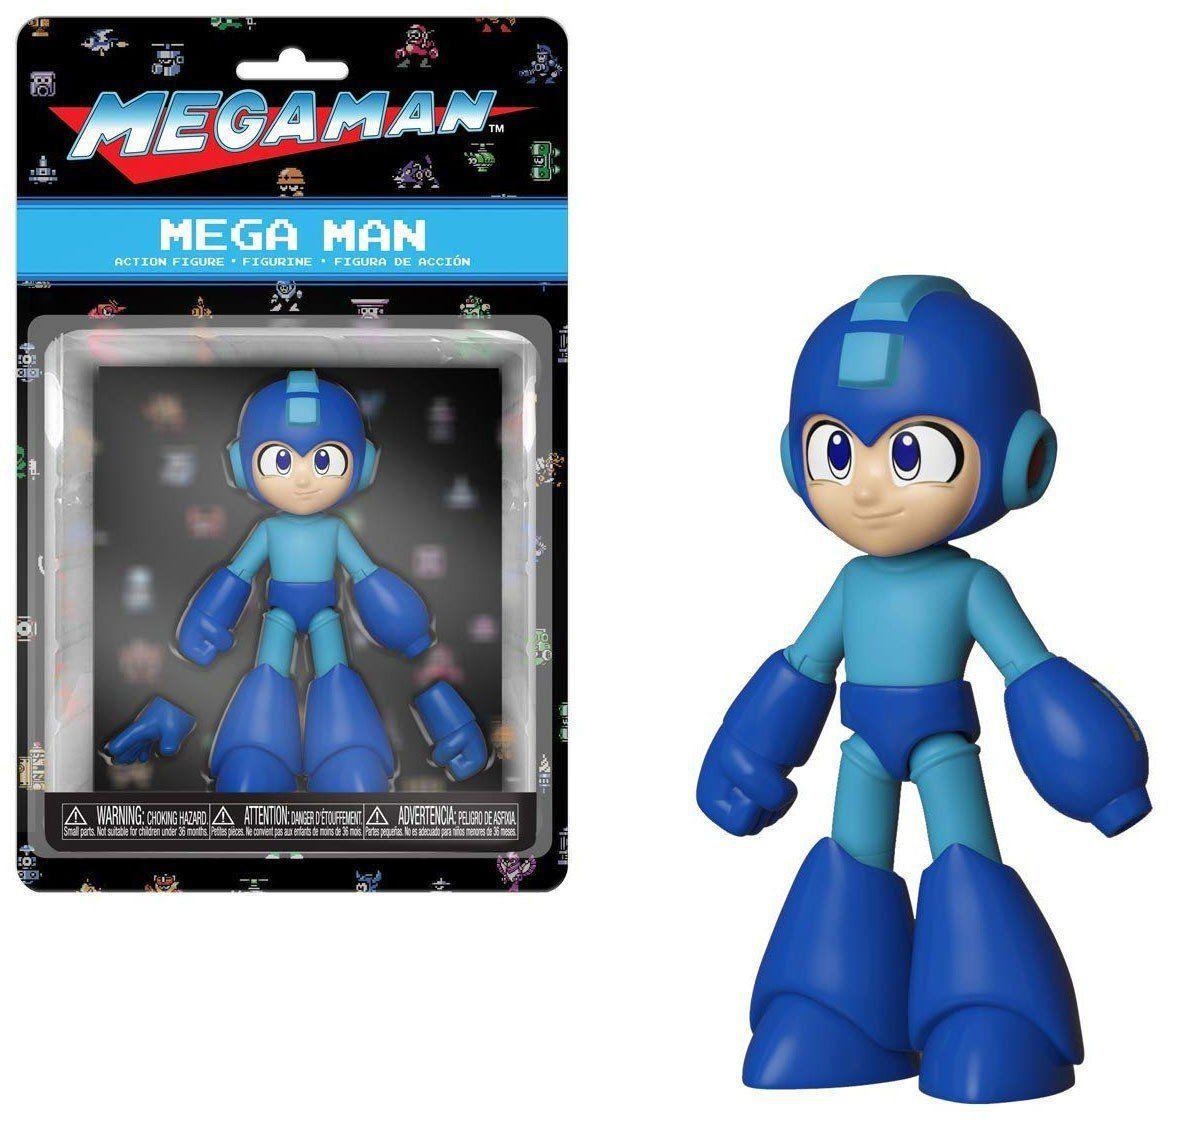 Funko Boneco Mega Man: Mega Man - Funko